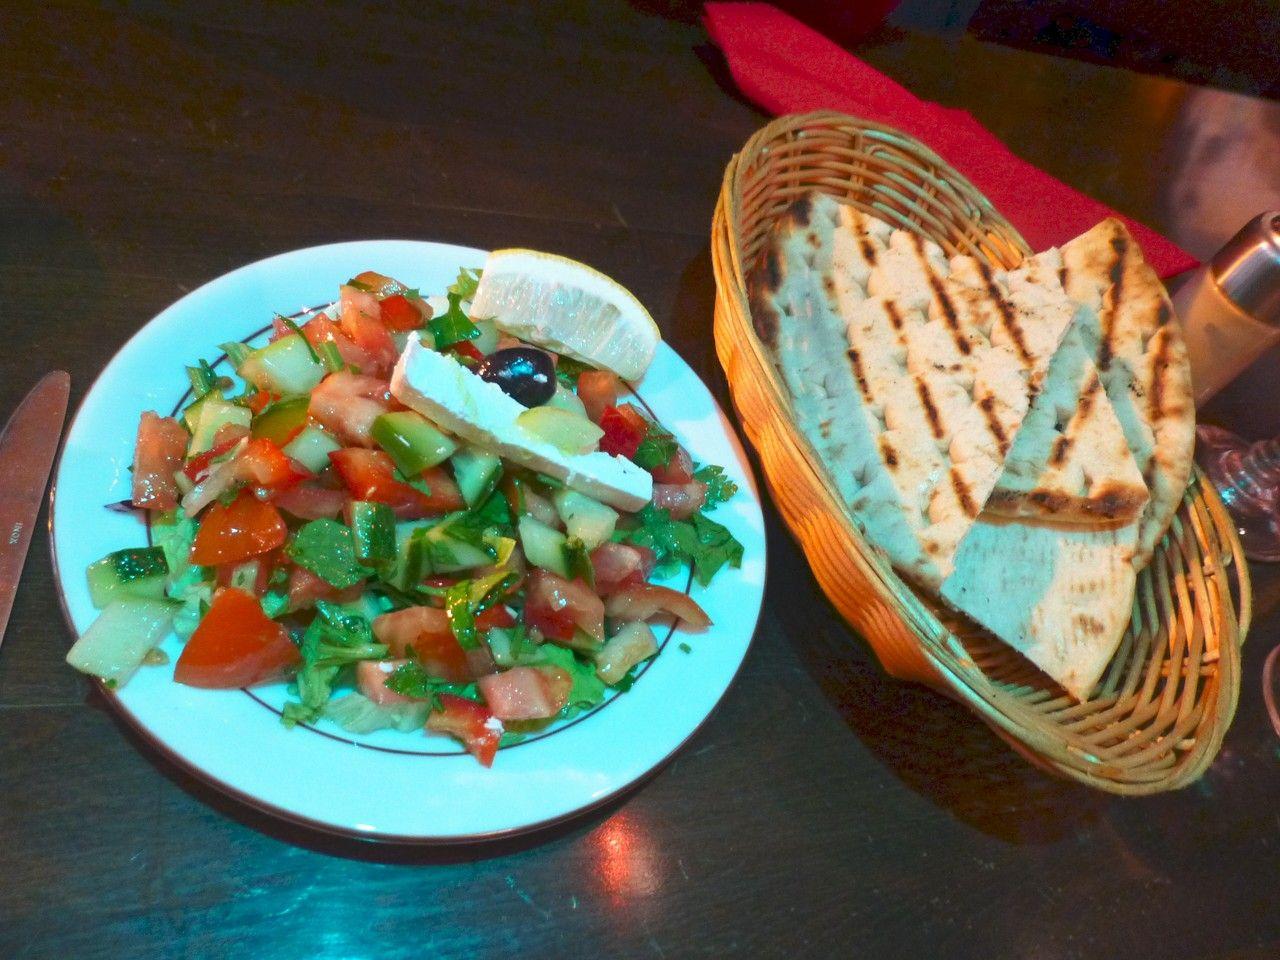 Restaurant turc à La Huchette ... Fabuleux !